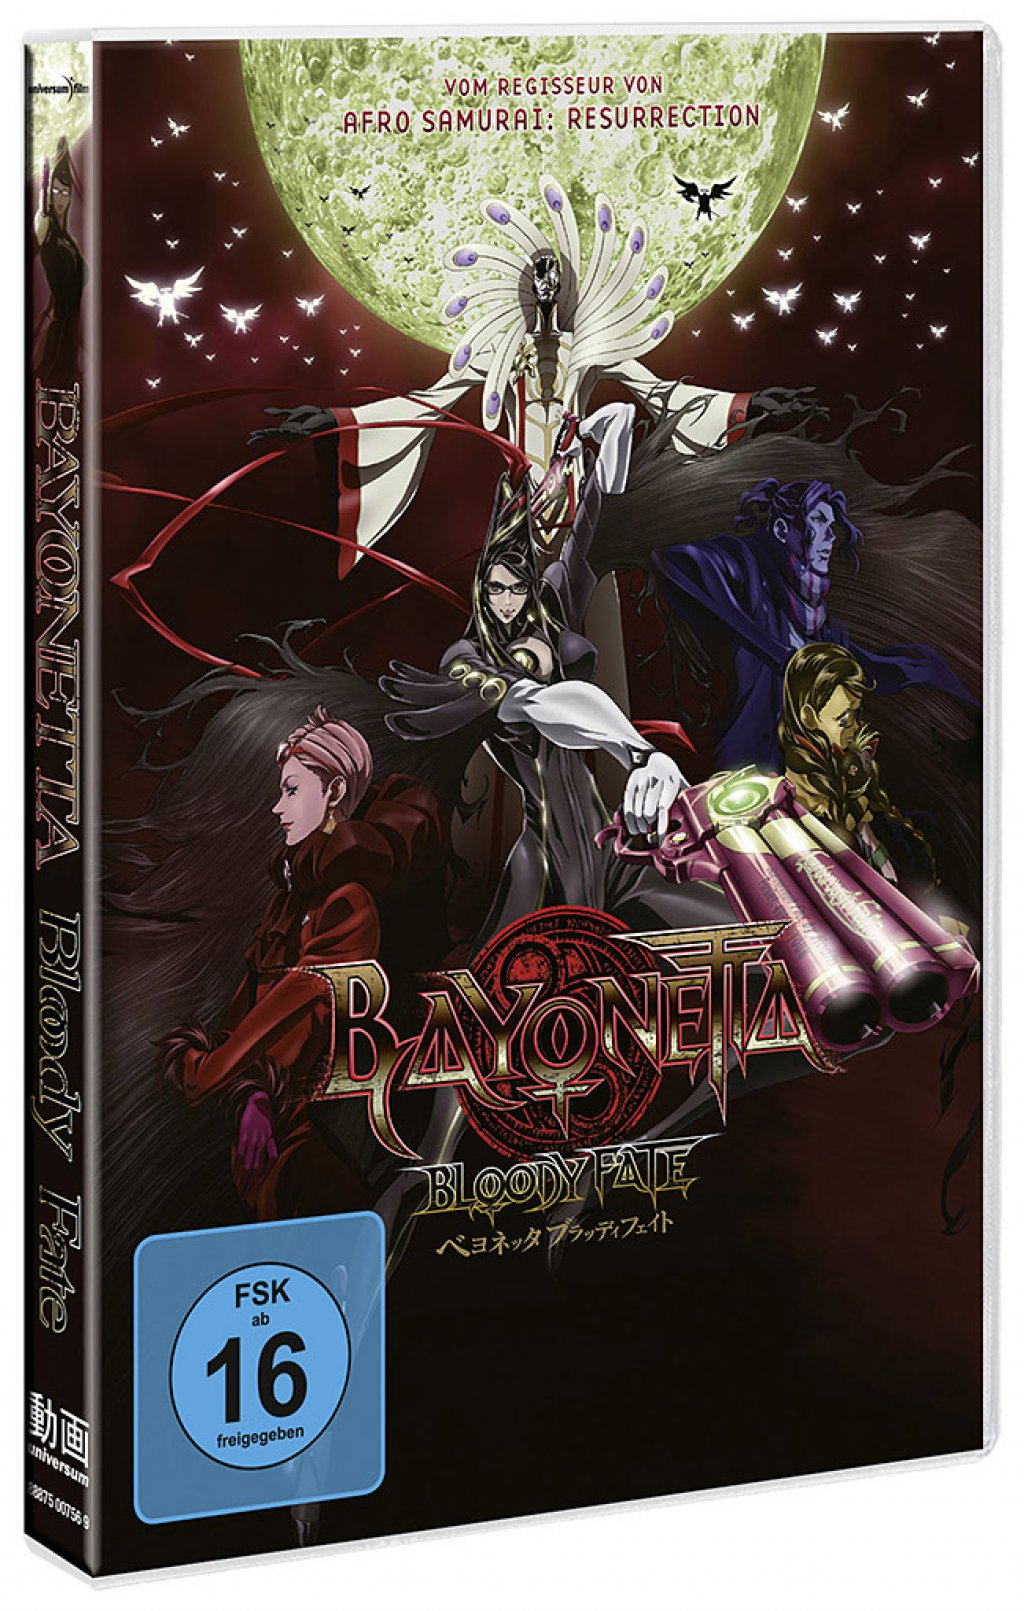 Anime review: Bayonetta: Bloody Fate (DVD) - Digitally